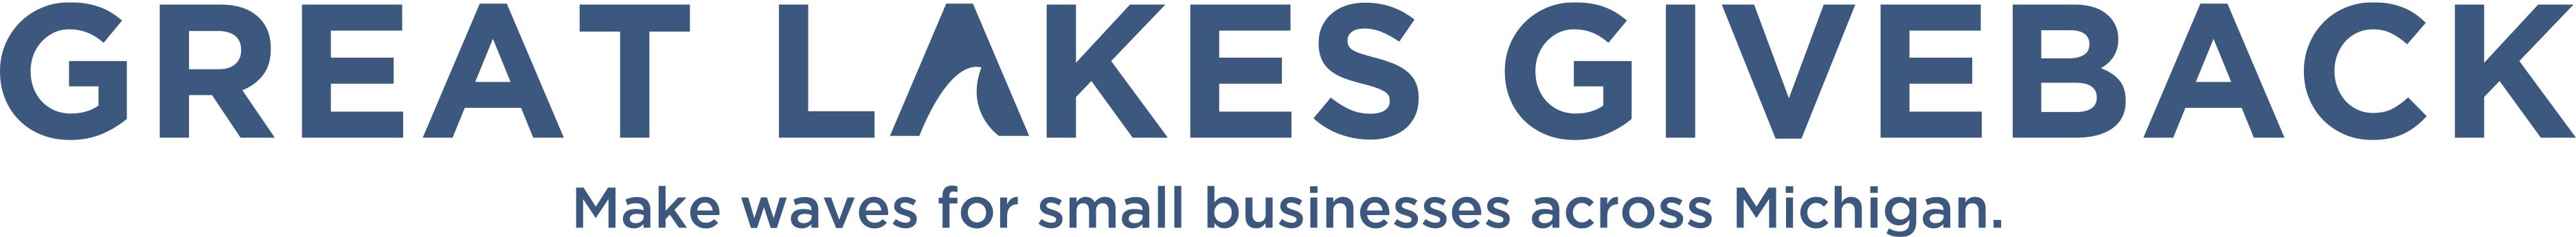 Lake Trust Great Lakes Give back logo